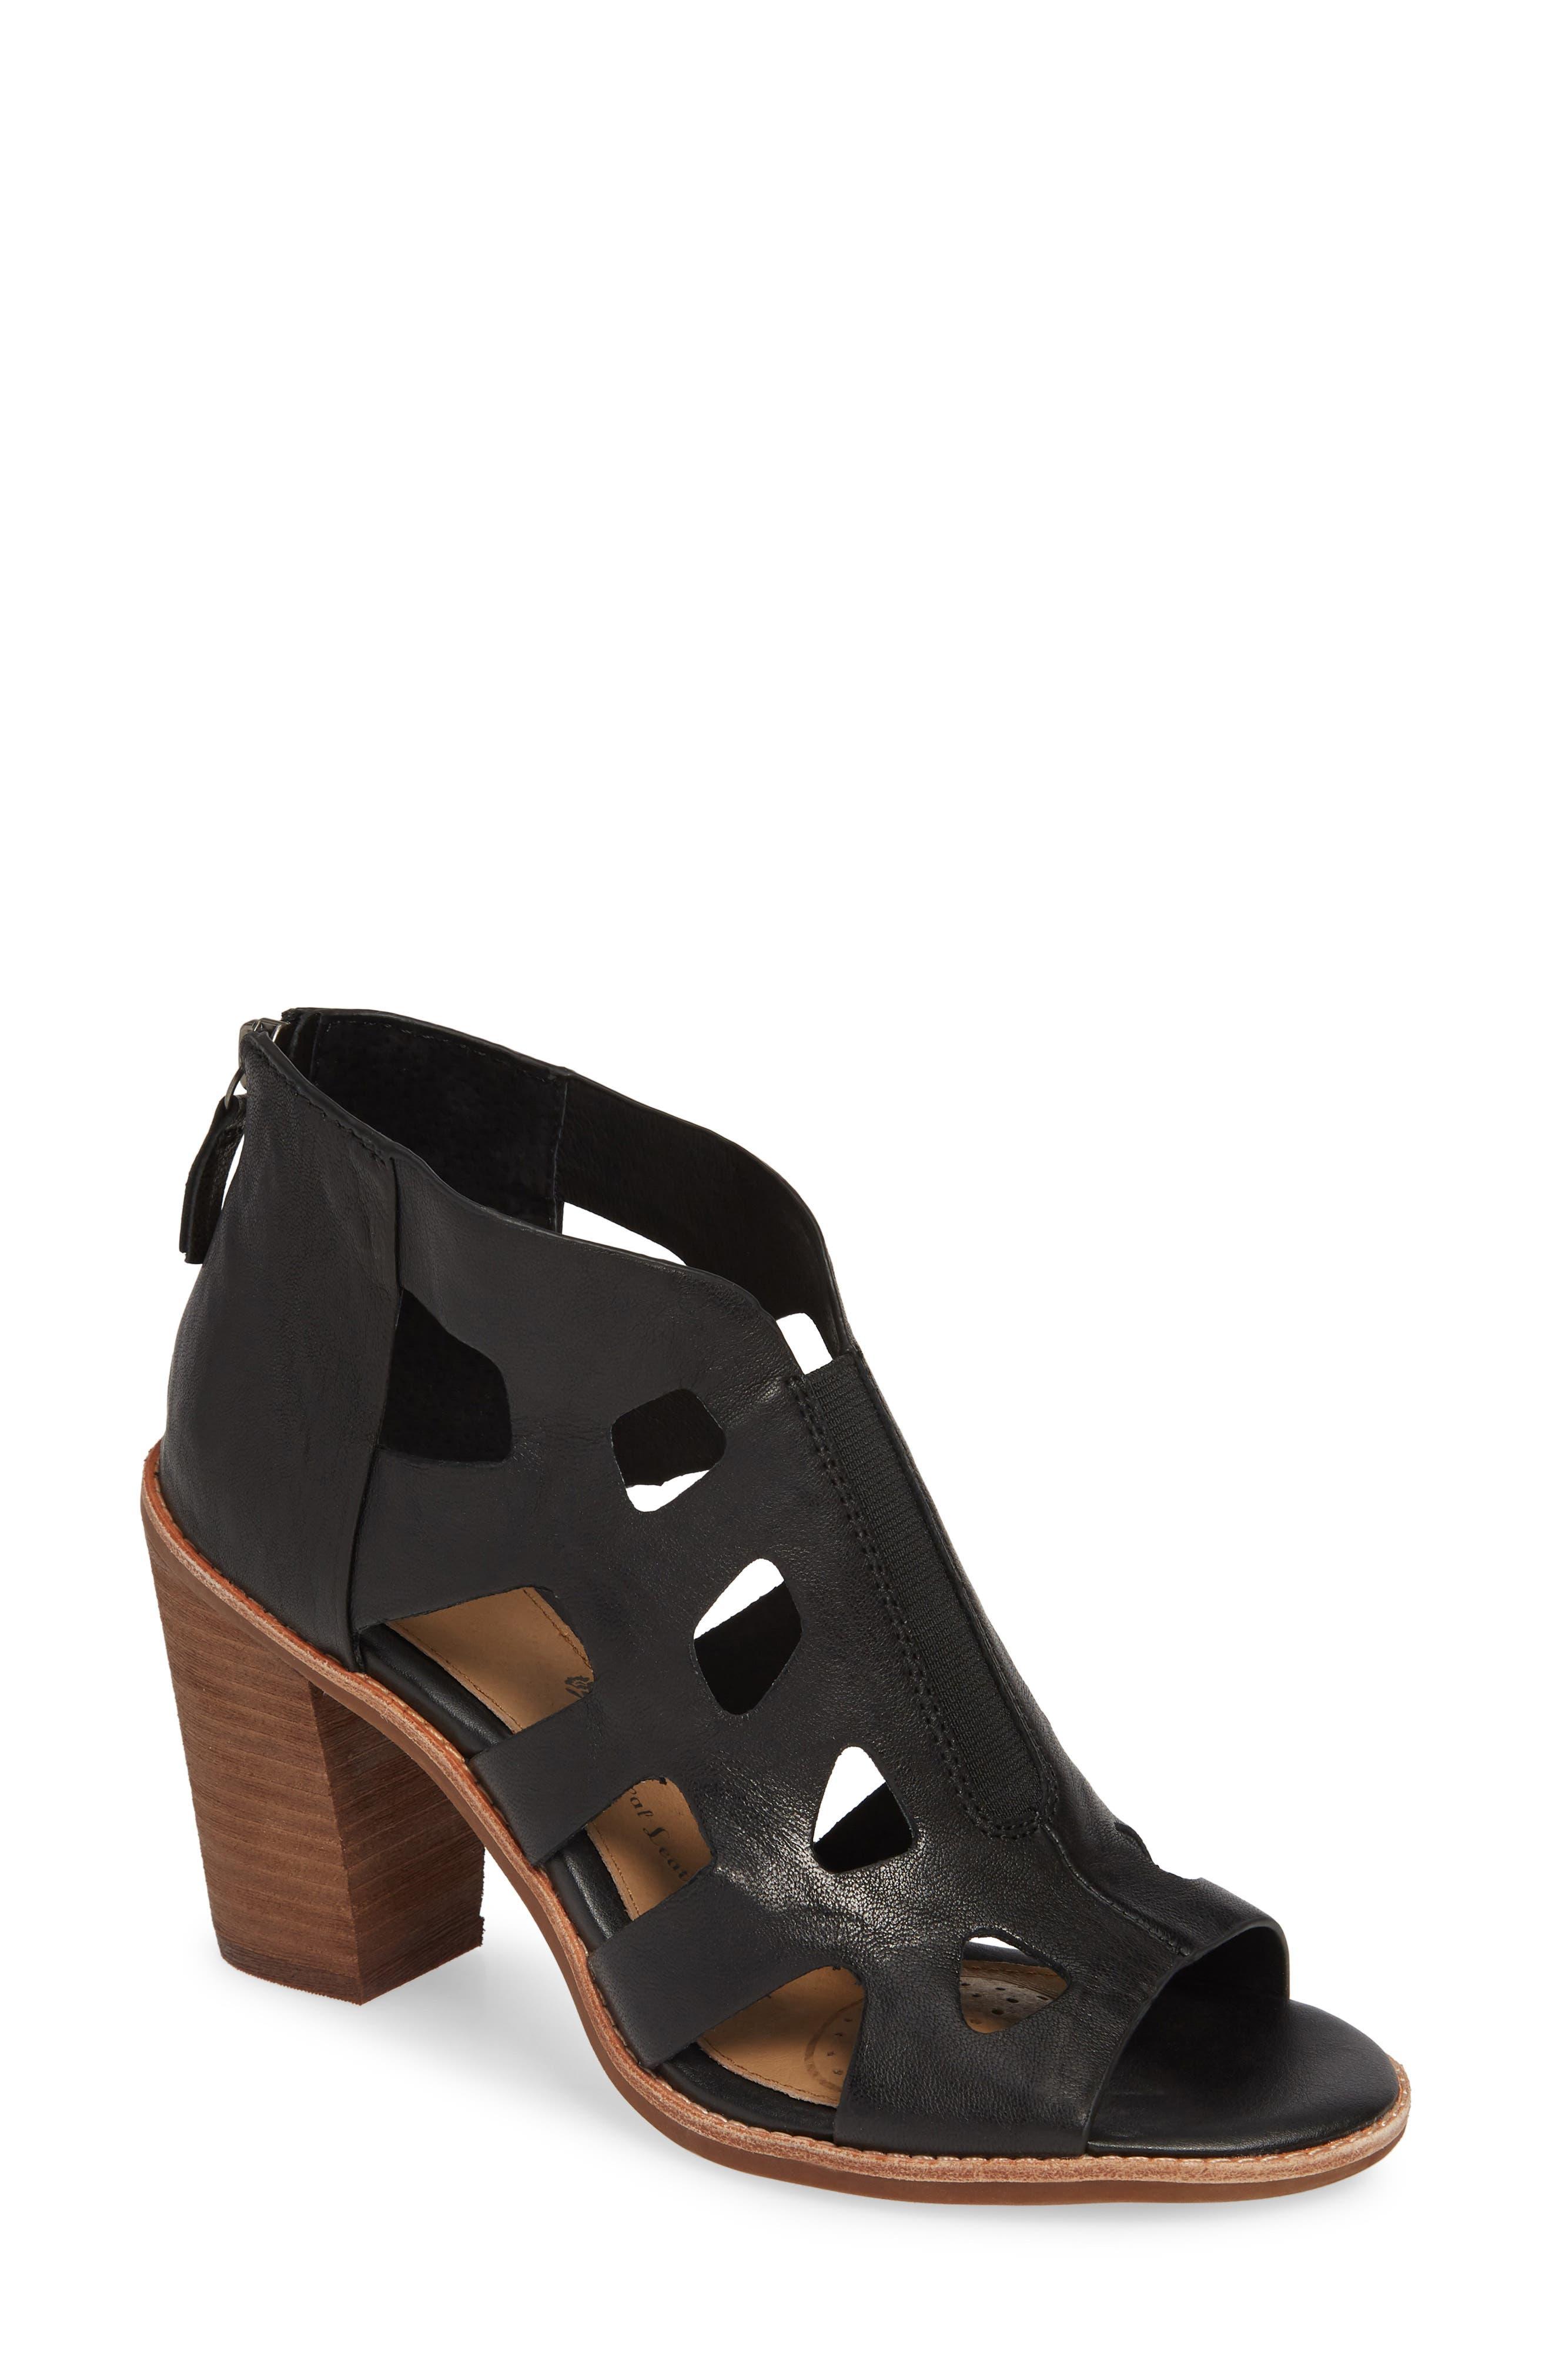 Pazia Block Heel Sandal,                             Main thumbnail 1, color,                             BLACK LEATHER